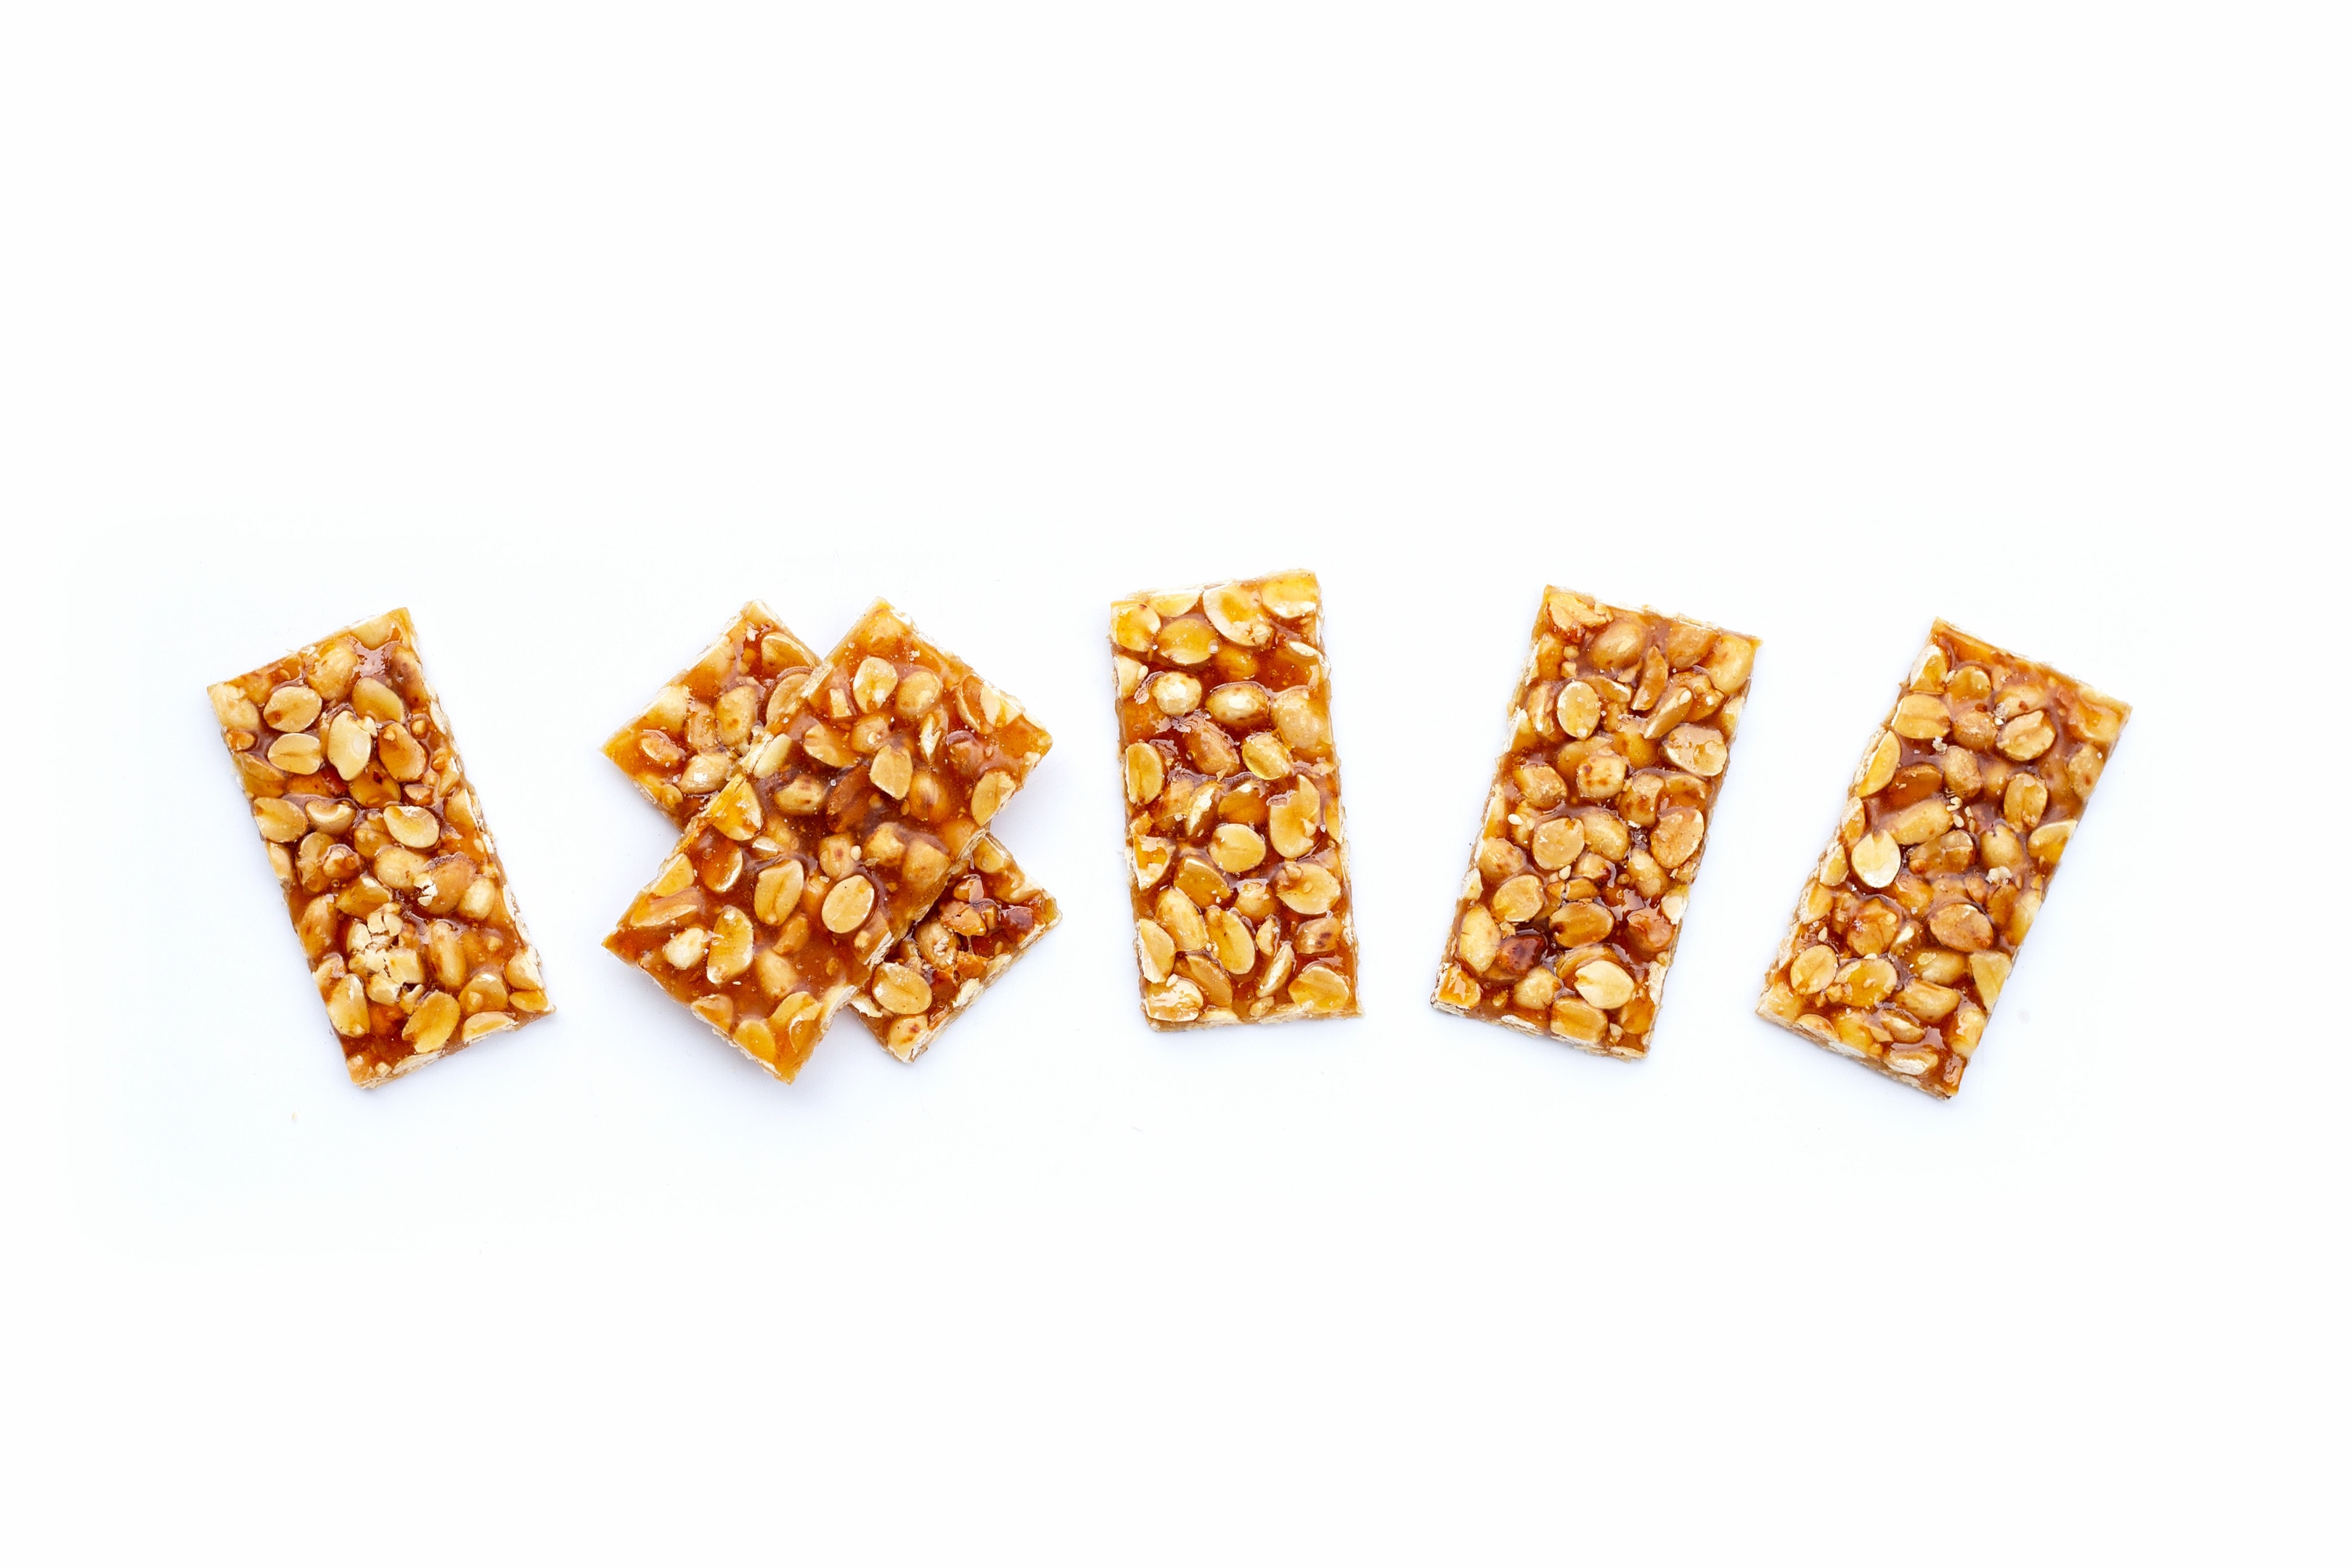 Kadalai mittai — peanuts and jaggery bars on white background